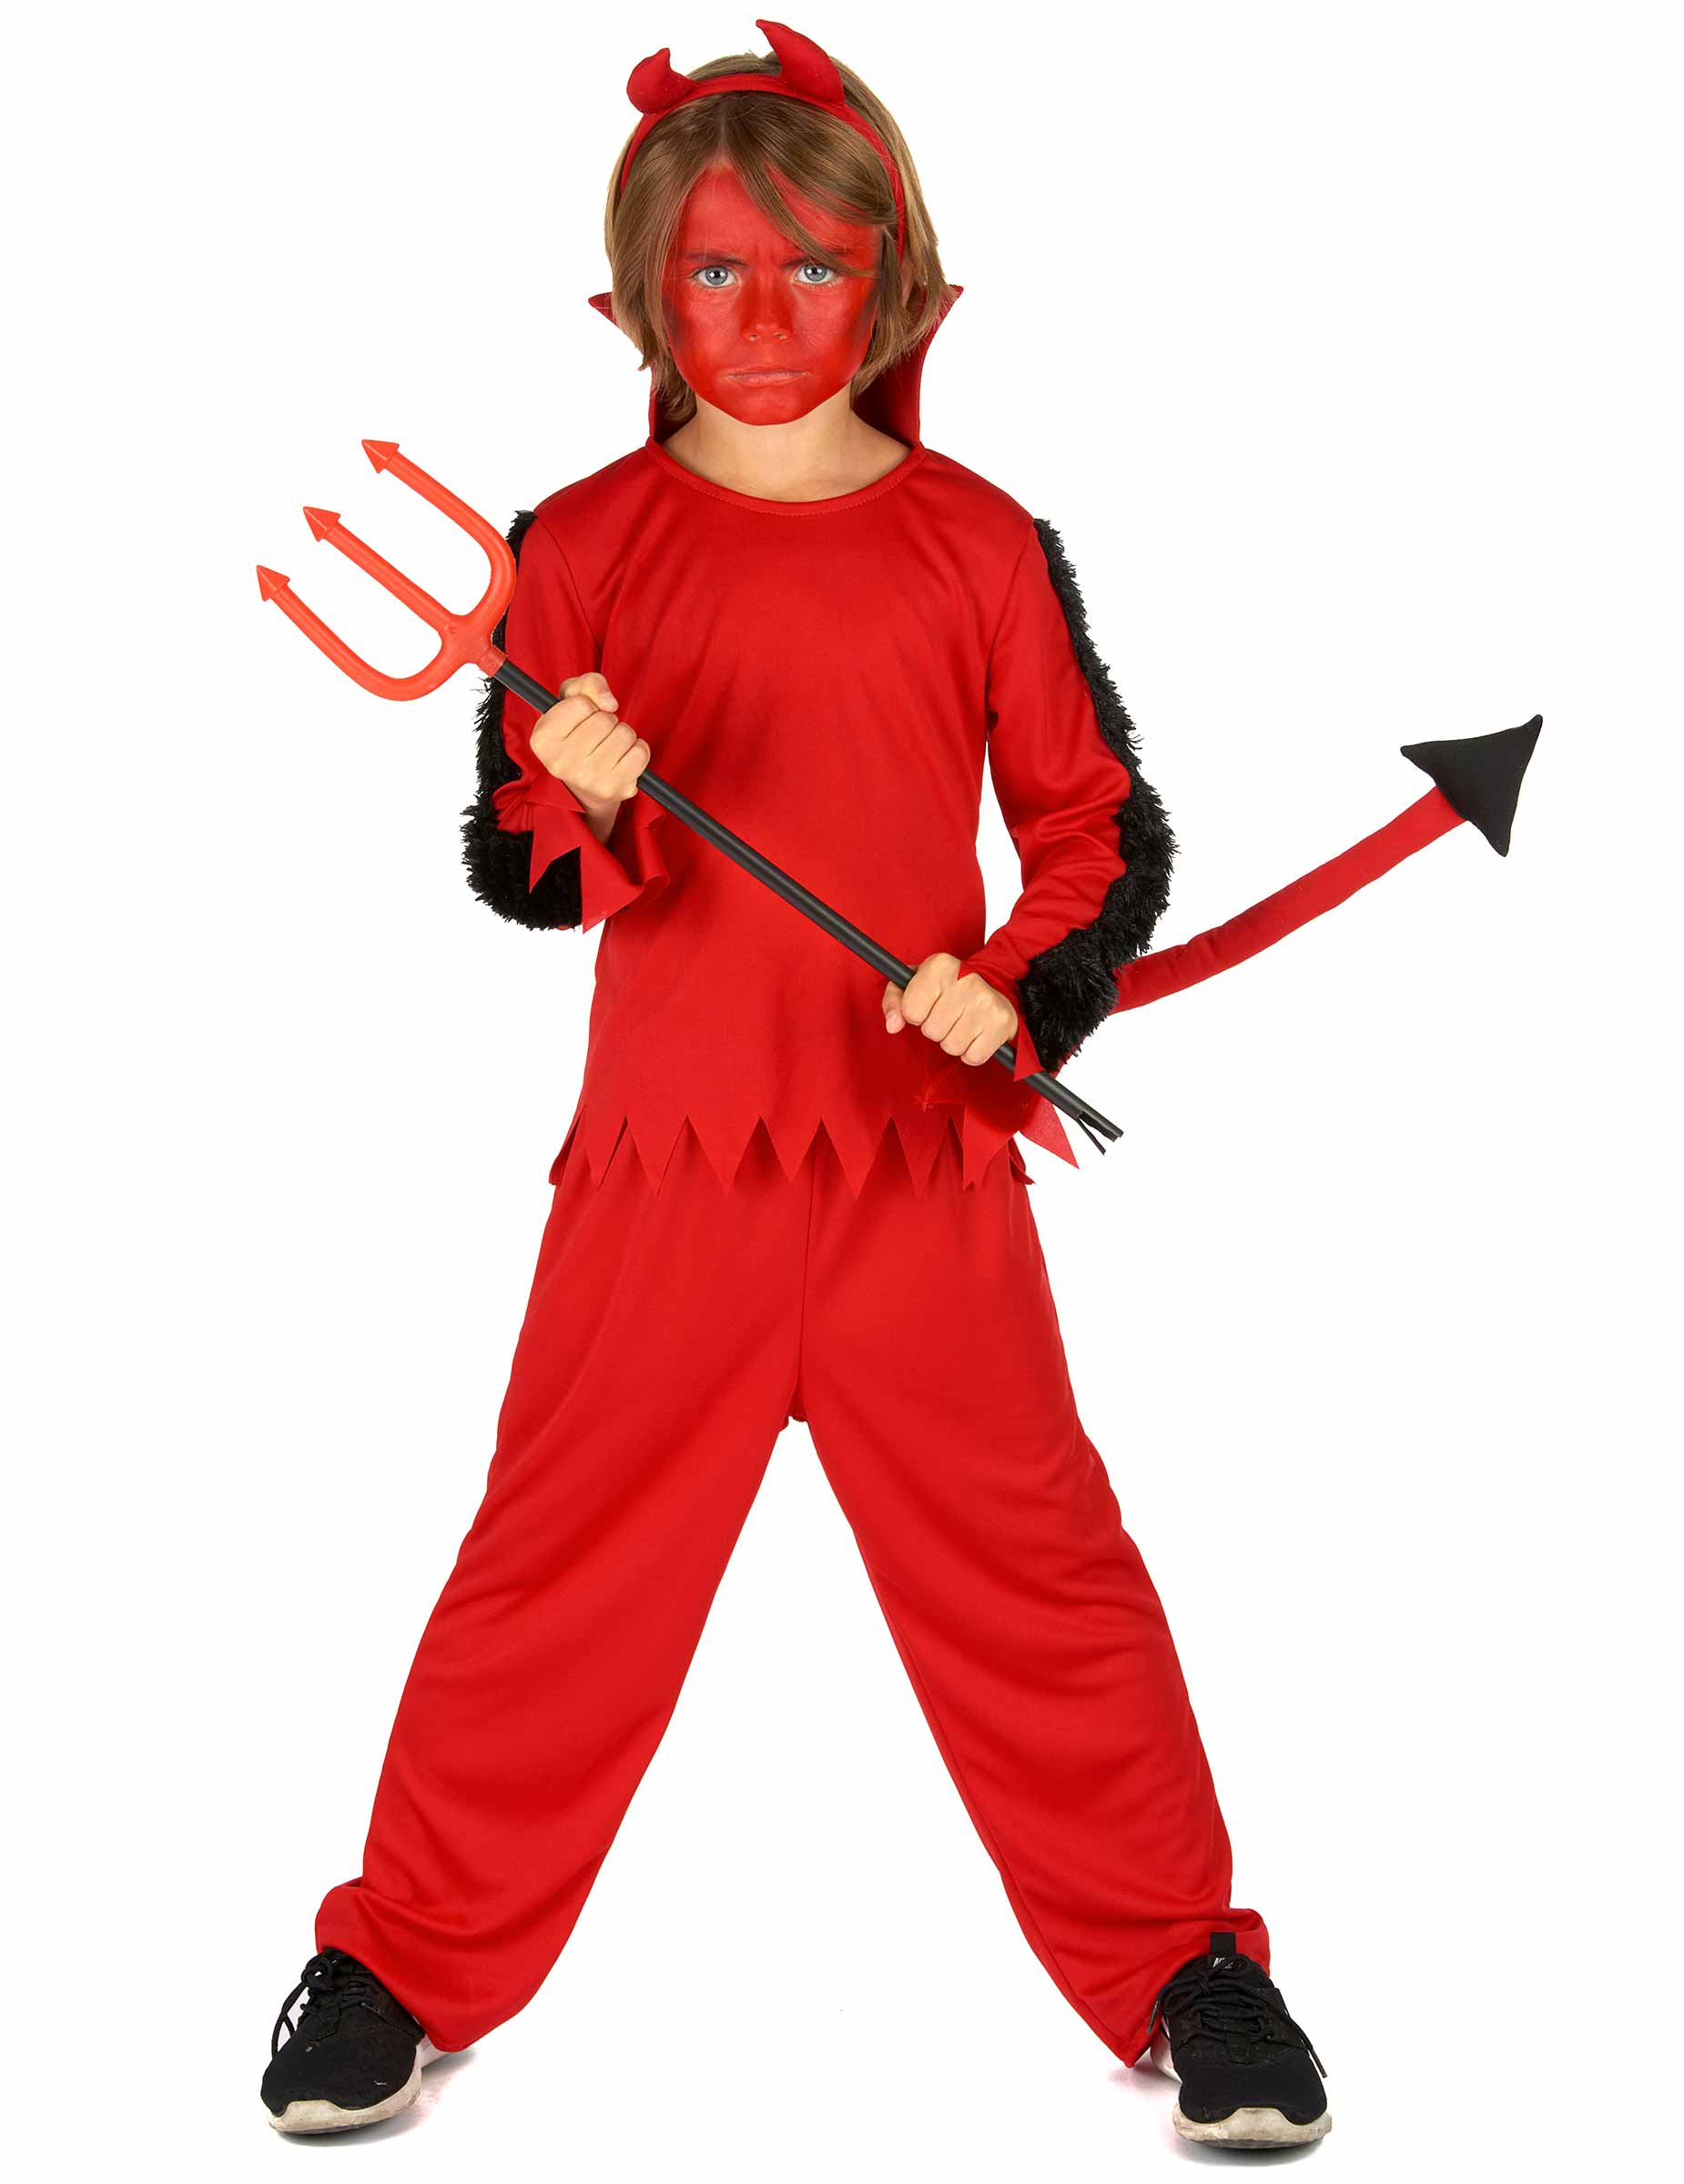 Teufels Kostum Fur Kinder